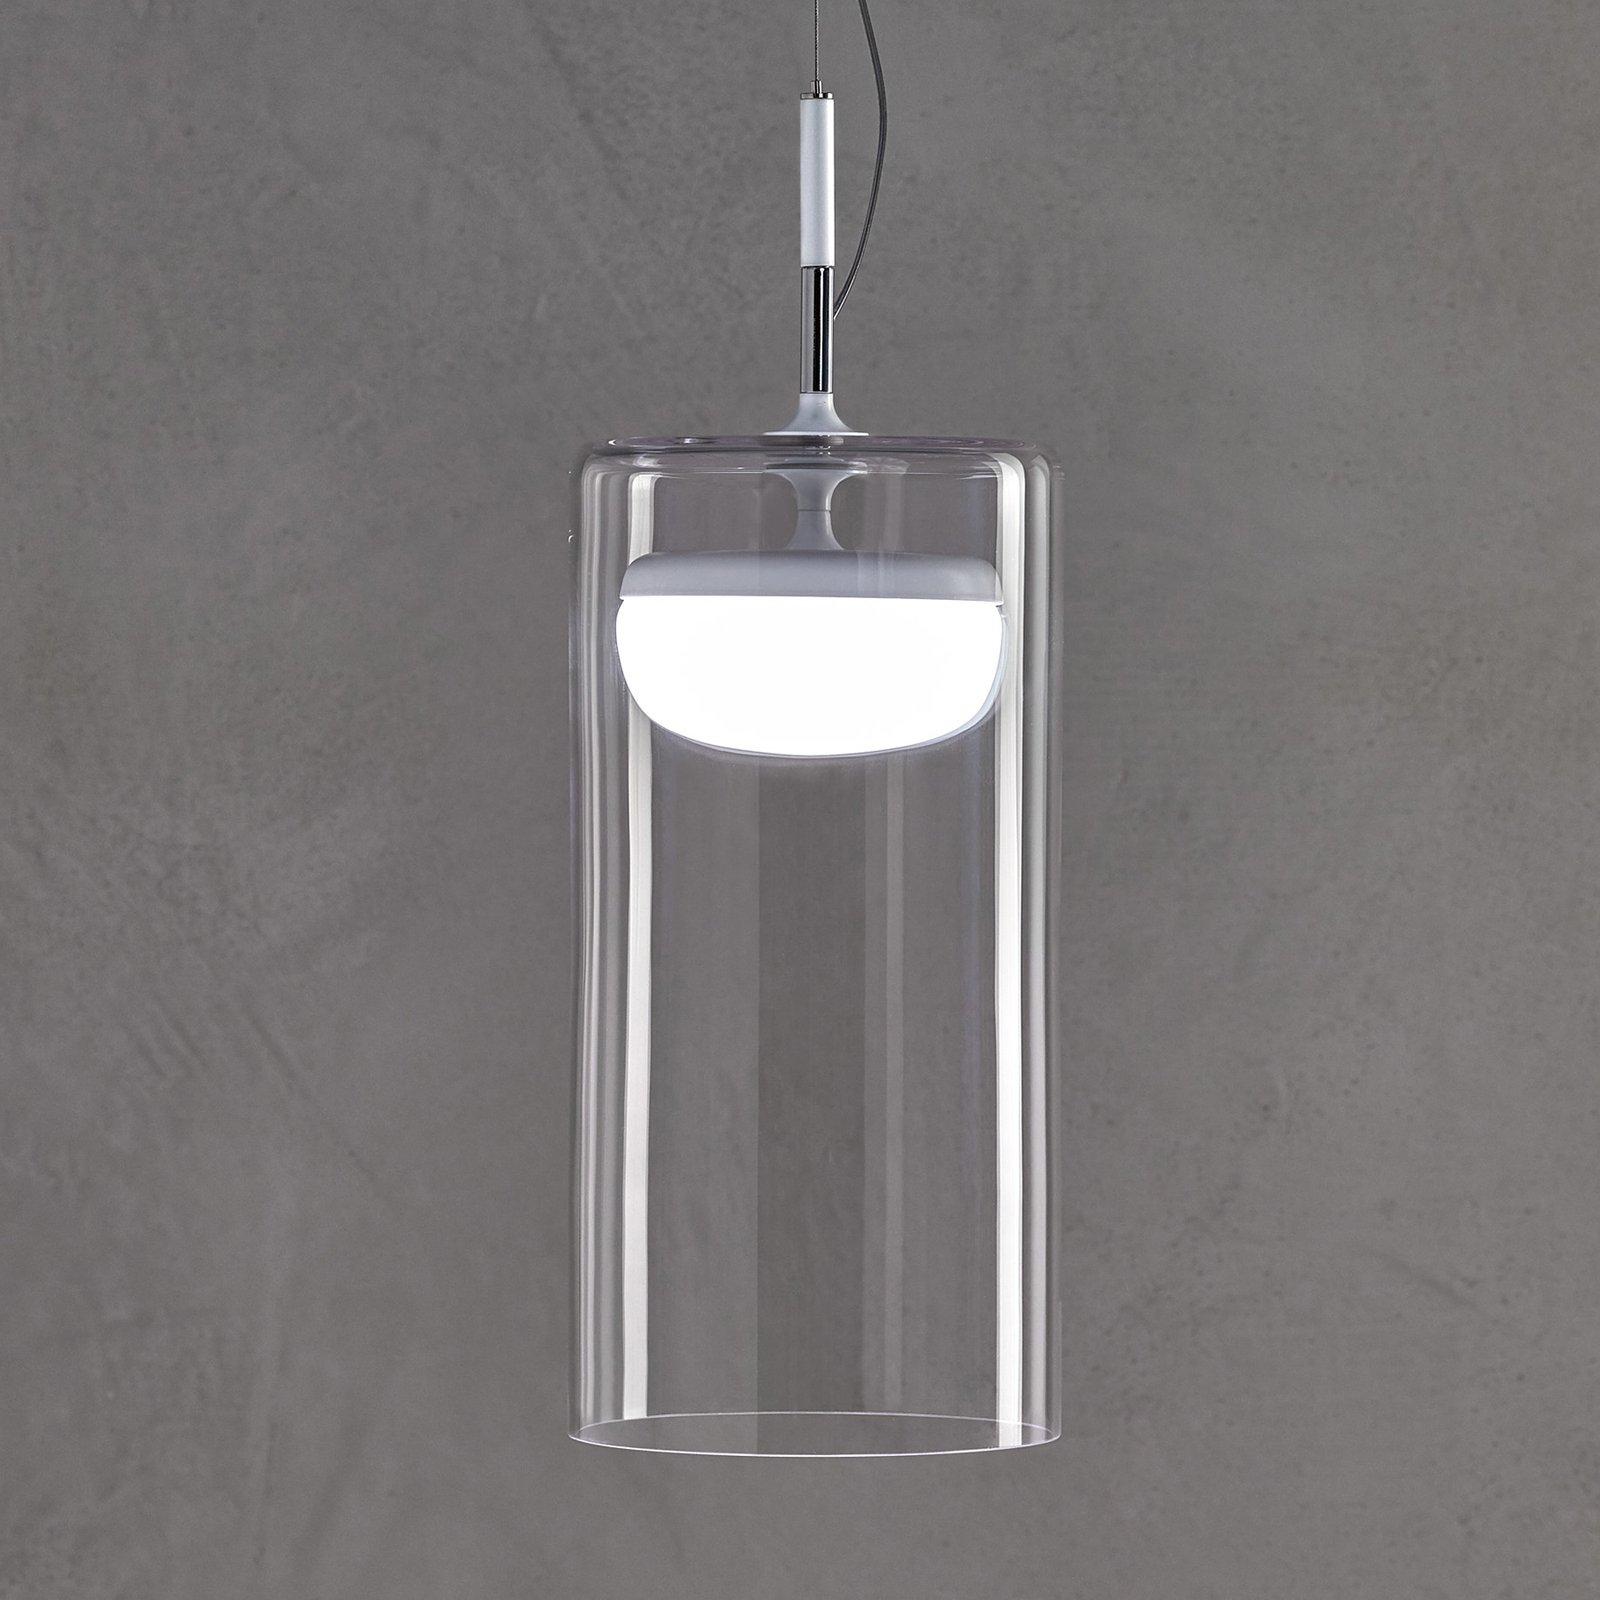 Prandina Driver LED-hengelampe S3 2 700 K hvit